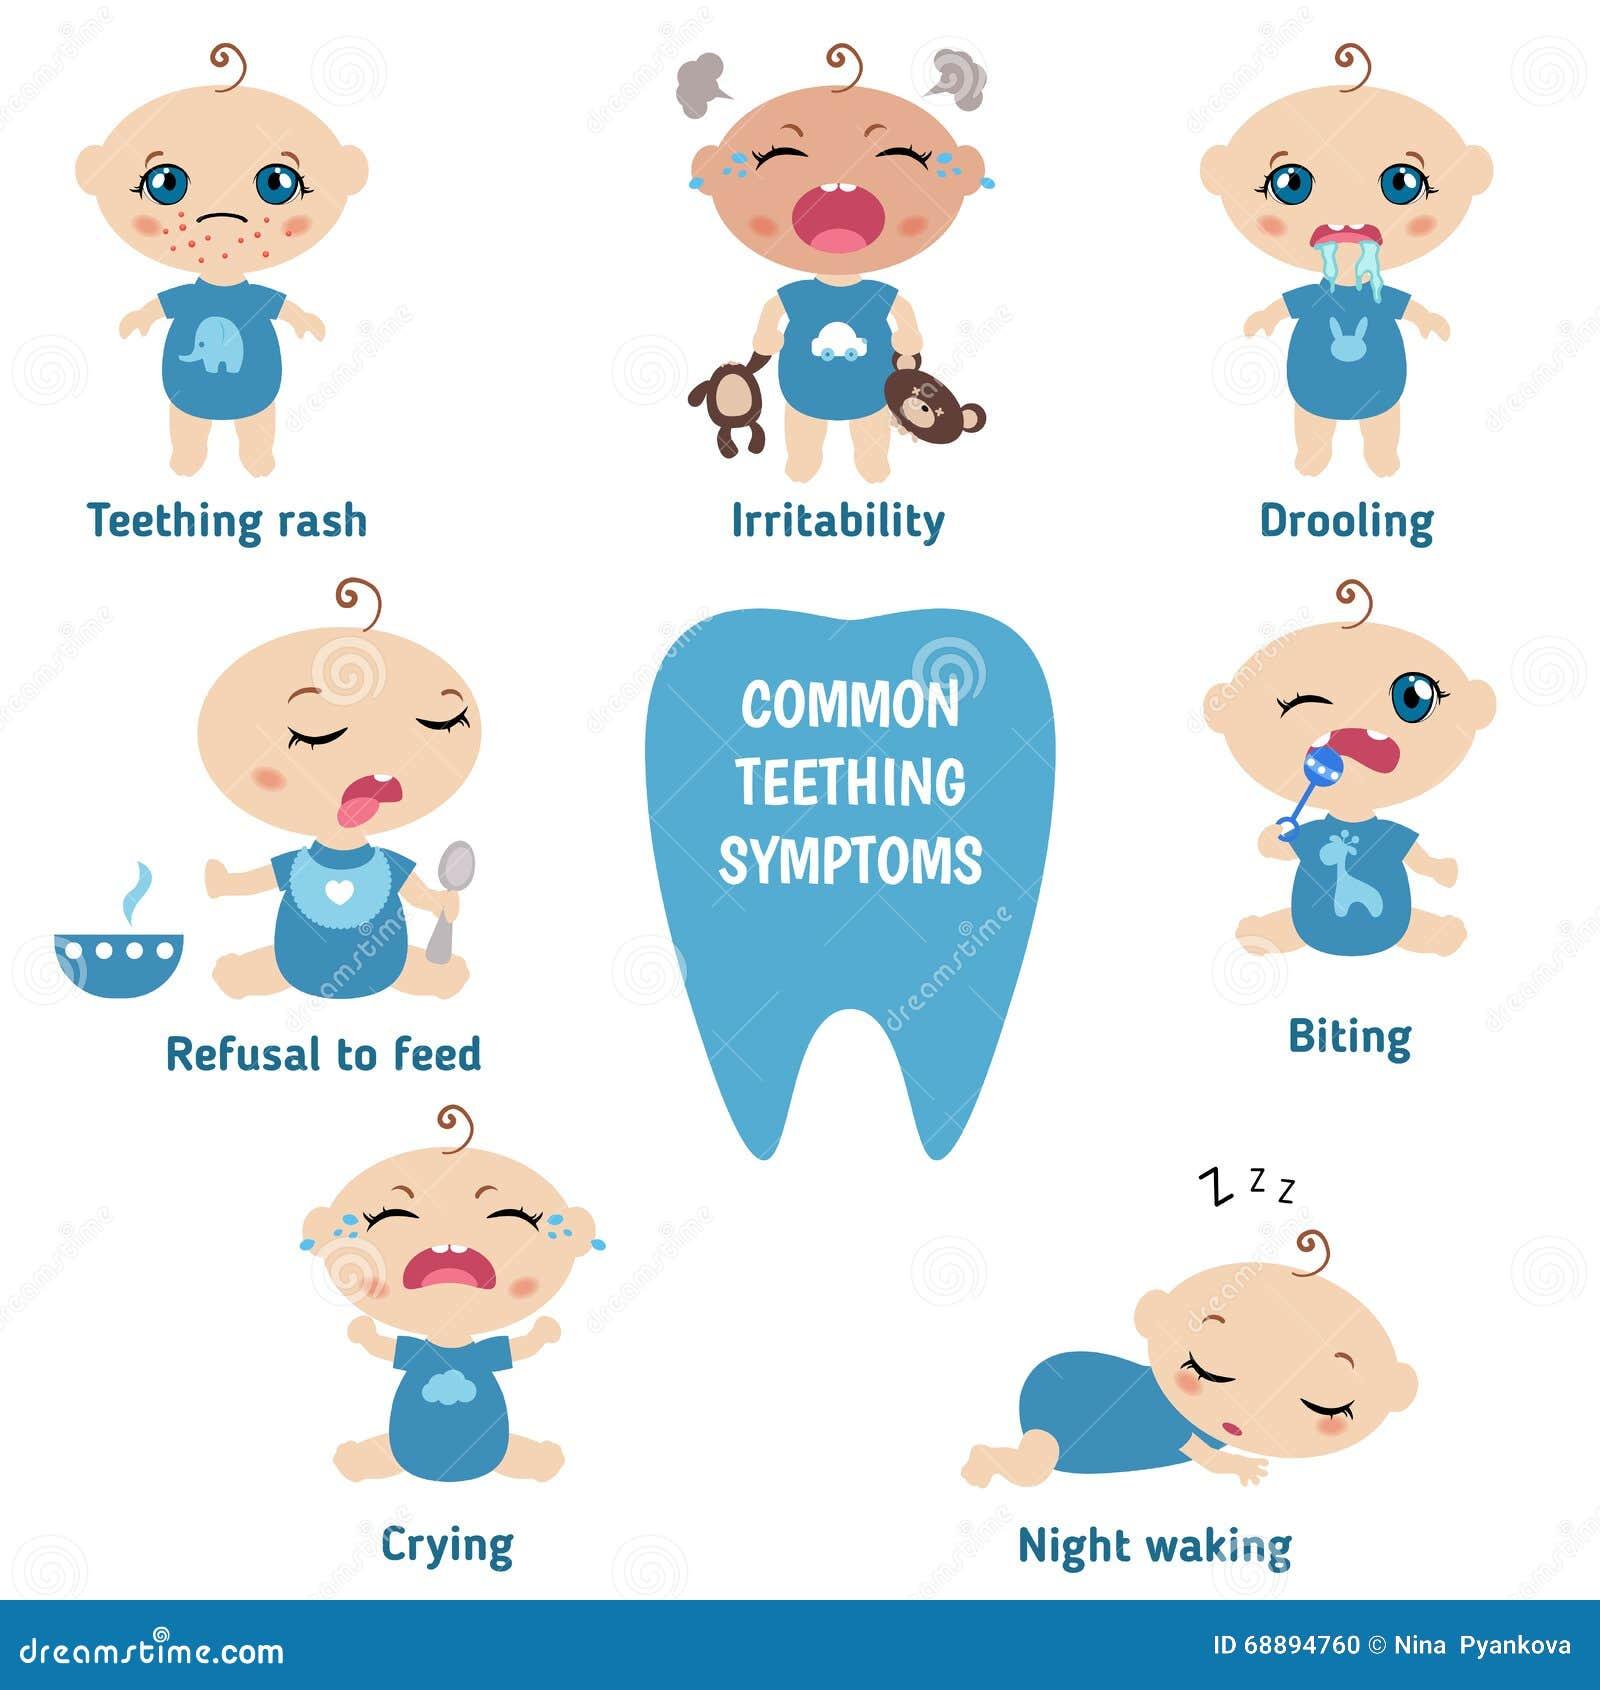 Baby Teething Symptoms Stock Vector - Image: 68894760